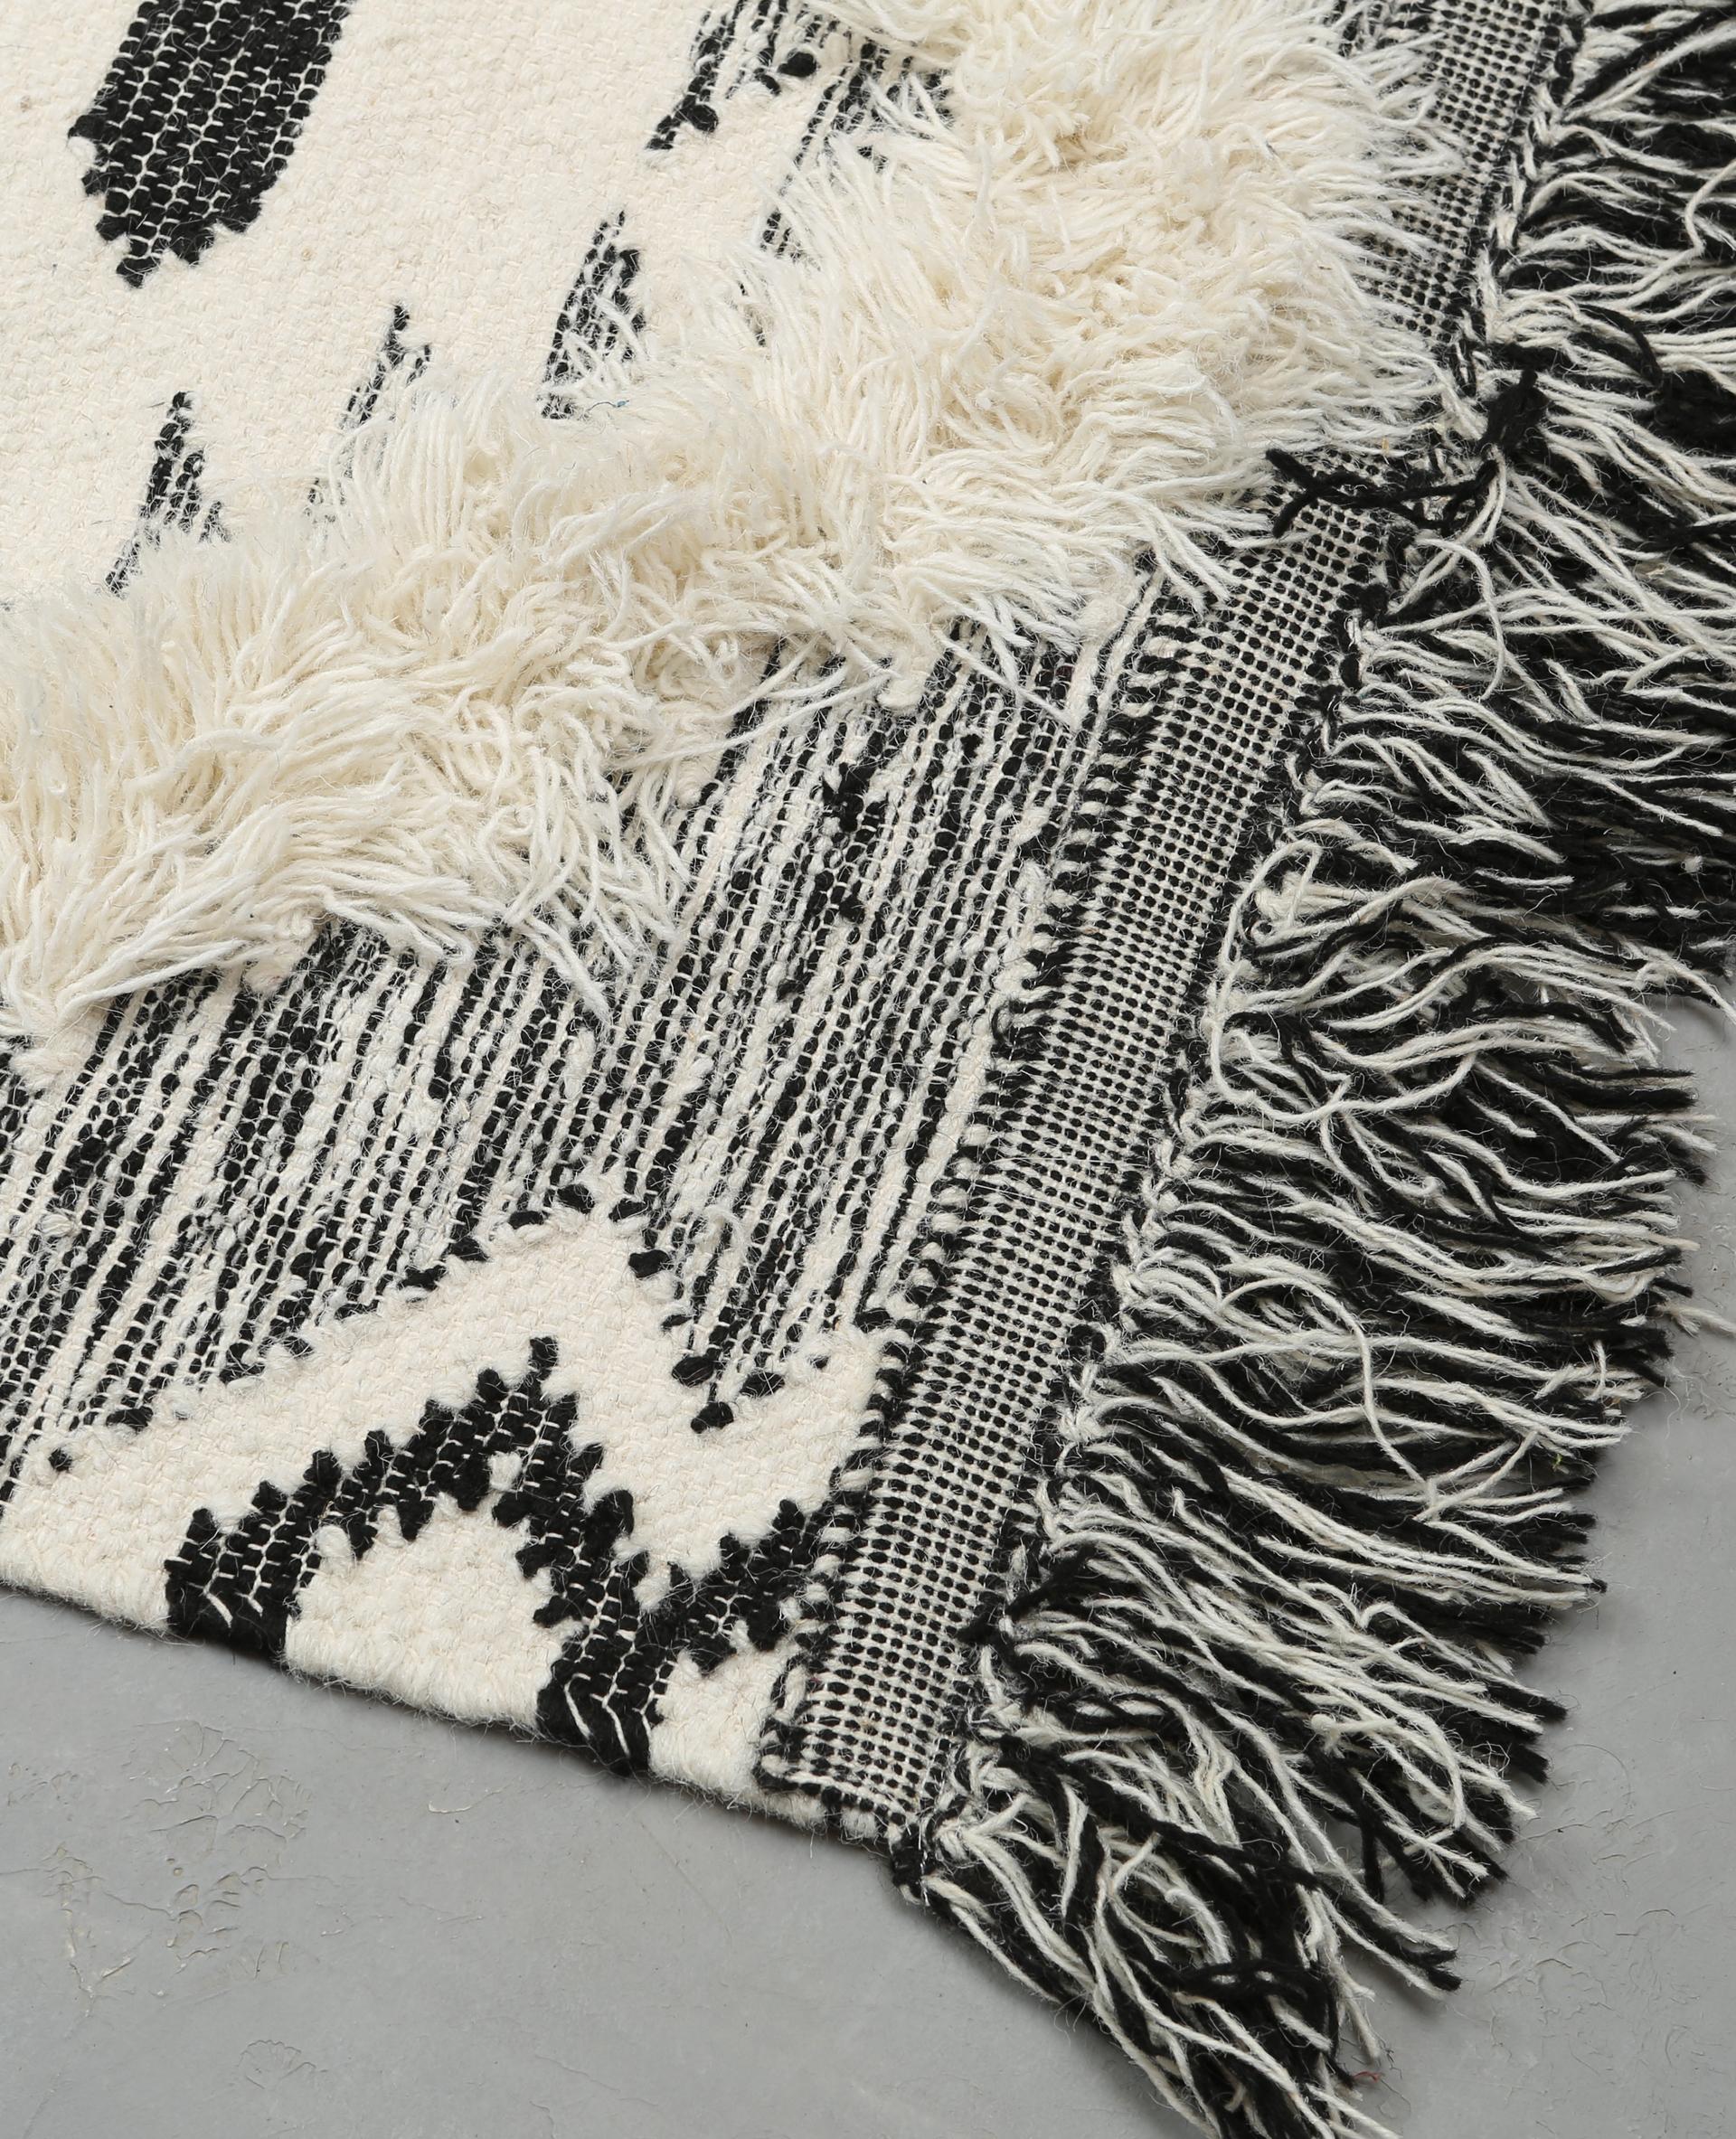 tapis coton tiss berb re noir 902998899f09 pimkie. Black Bedroom Furniture Sets. Home Design Ideas